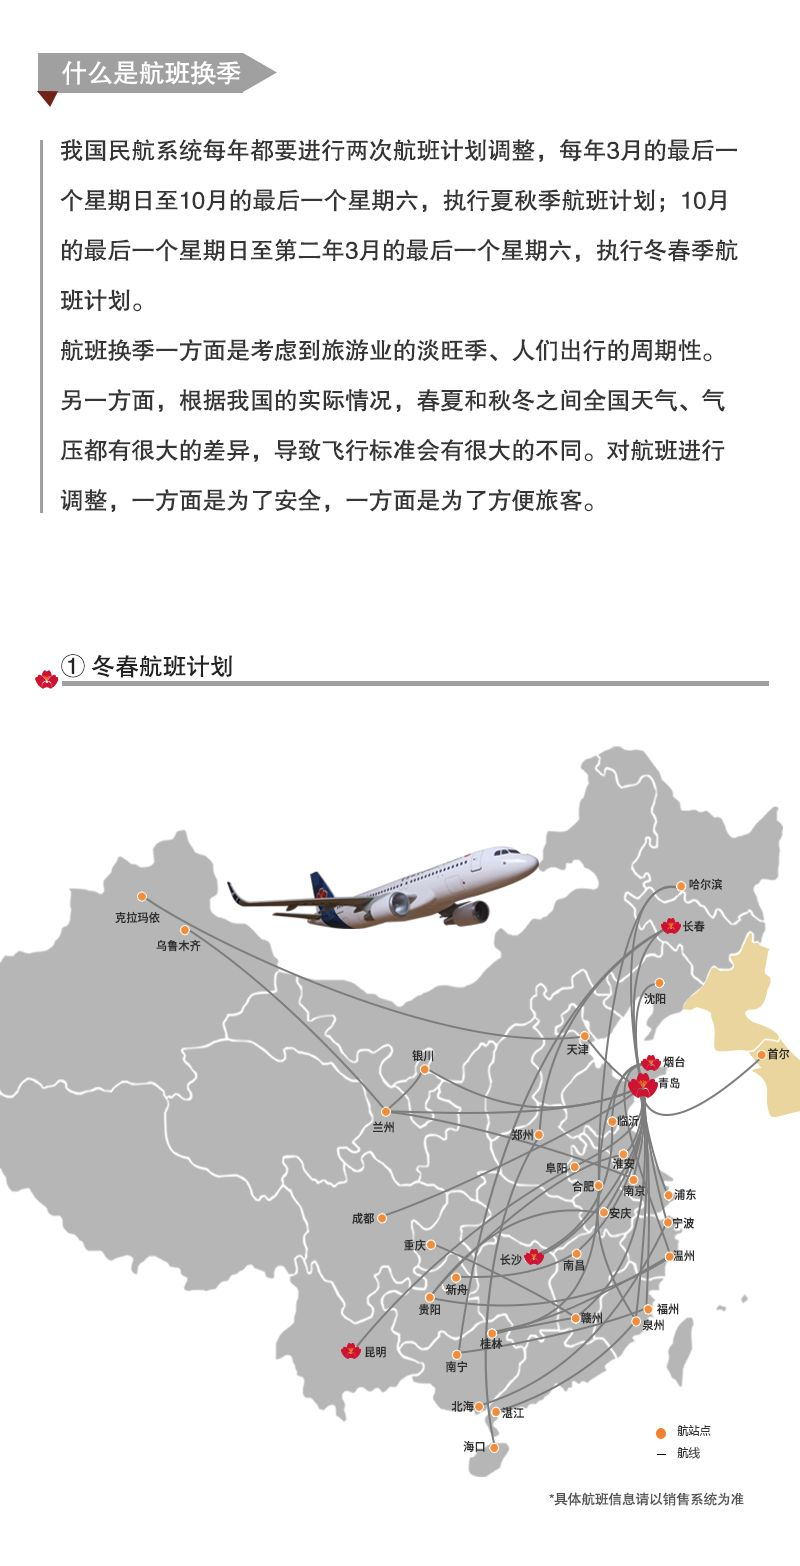 qingdao airlines winter flight schedule 2018 2019 route map